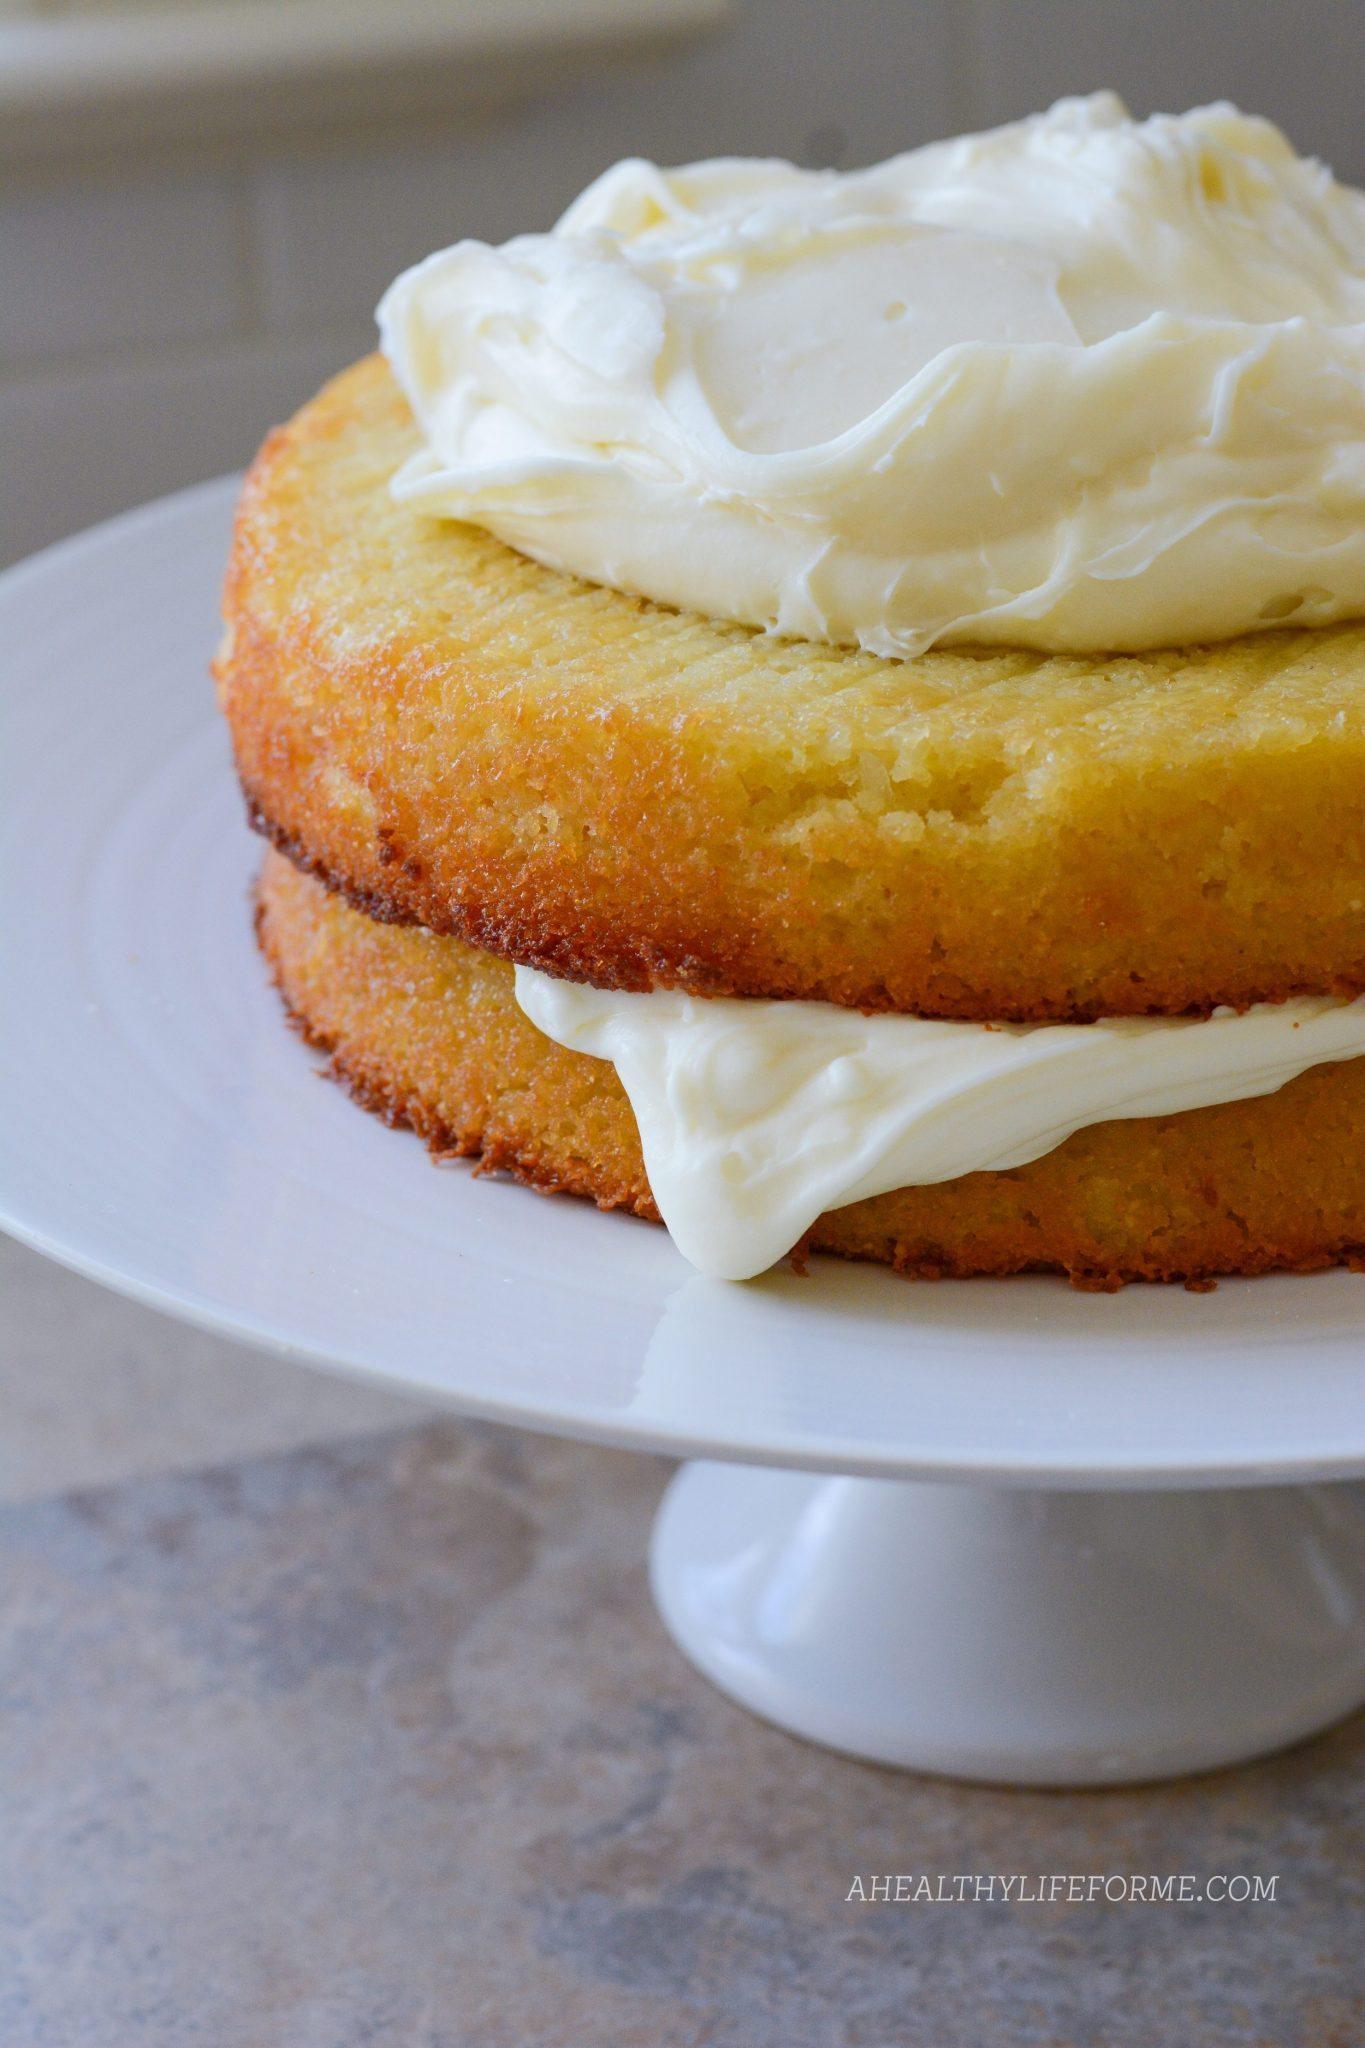 Healthy Cake Recipes Using Coconut Flour